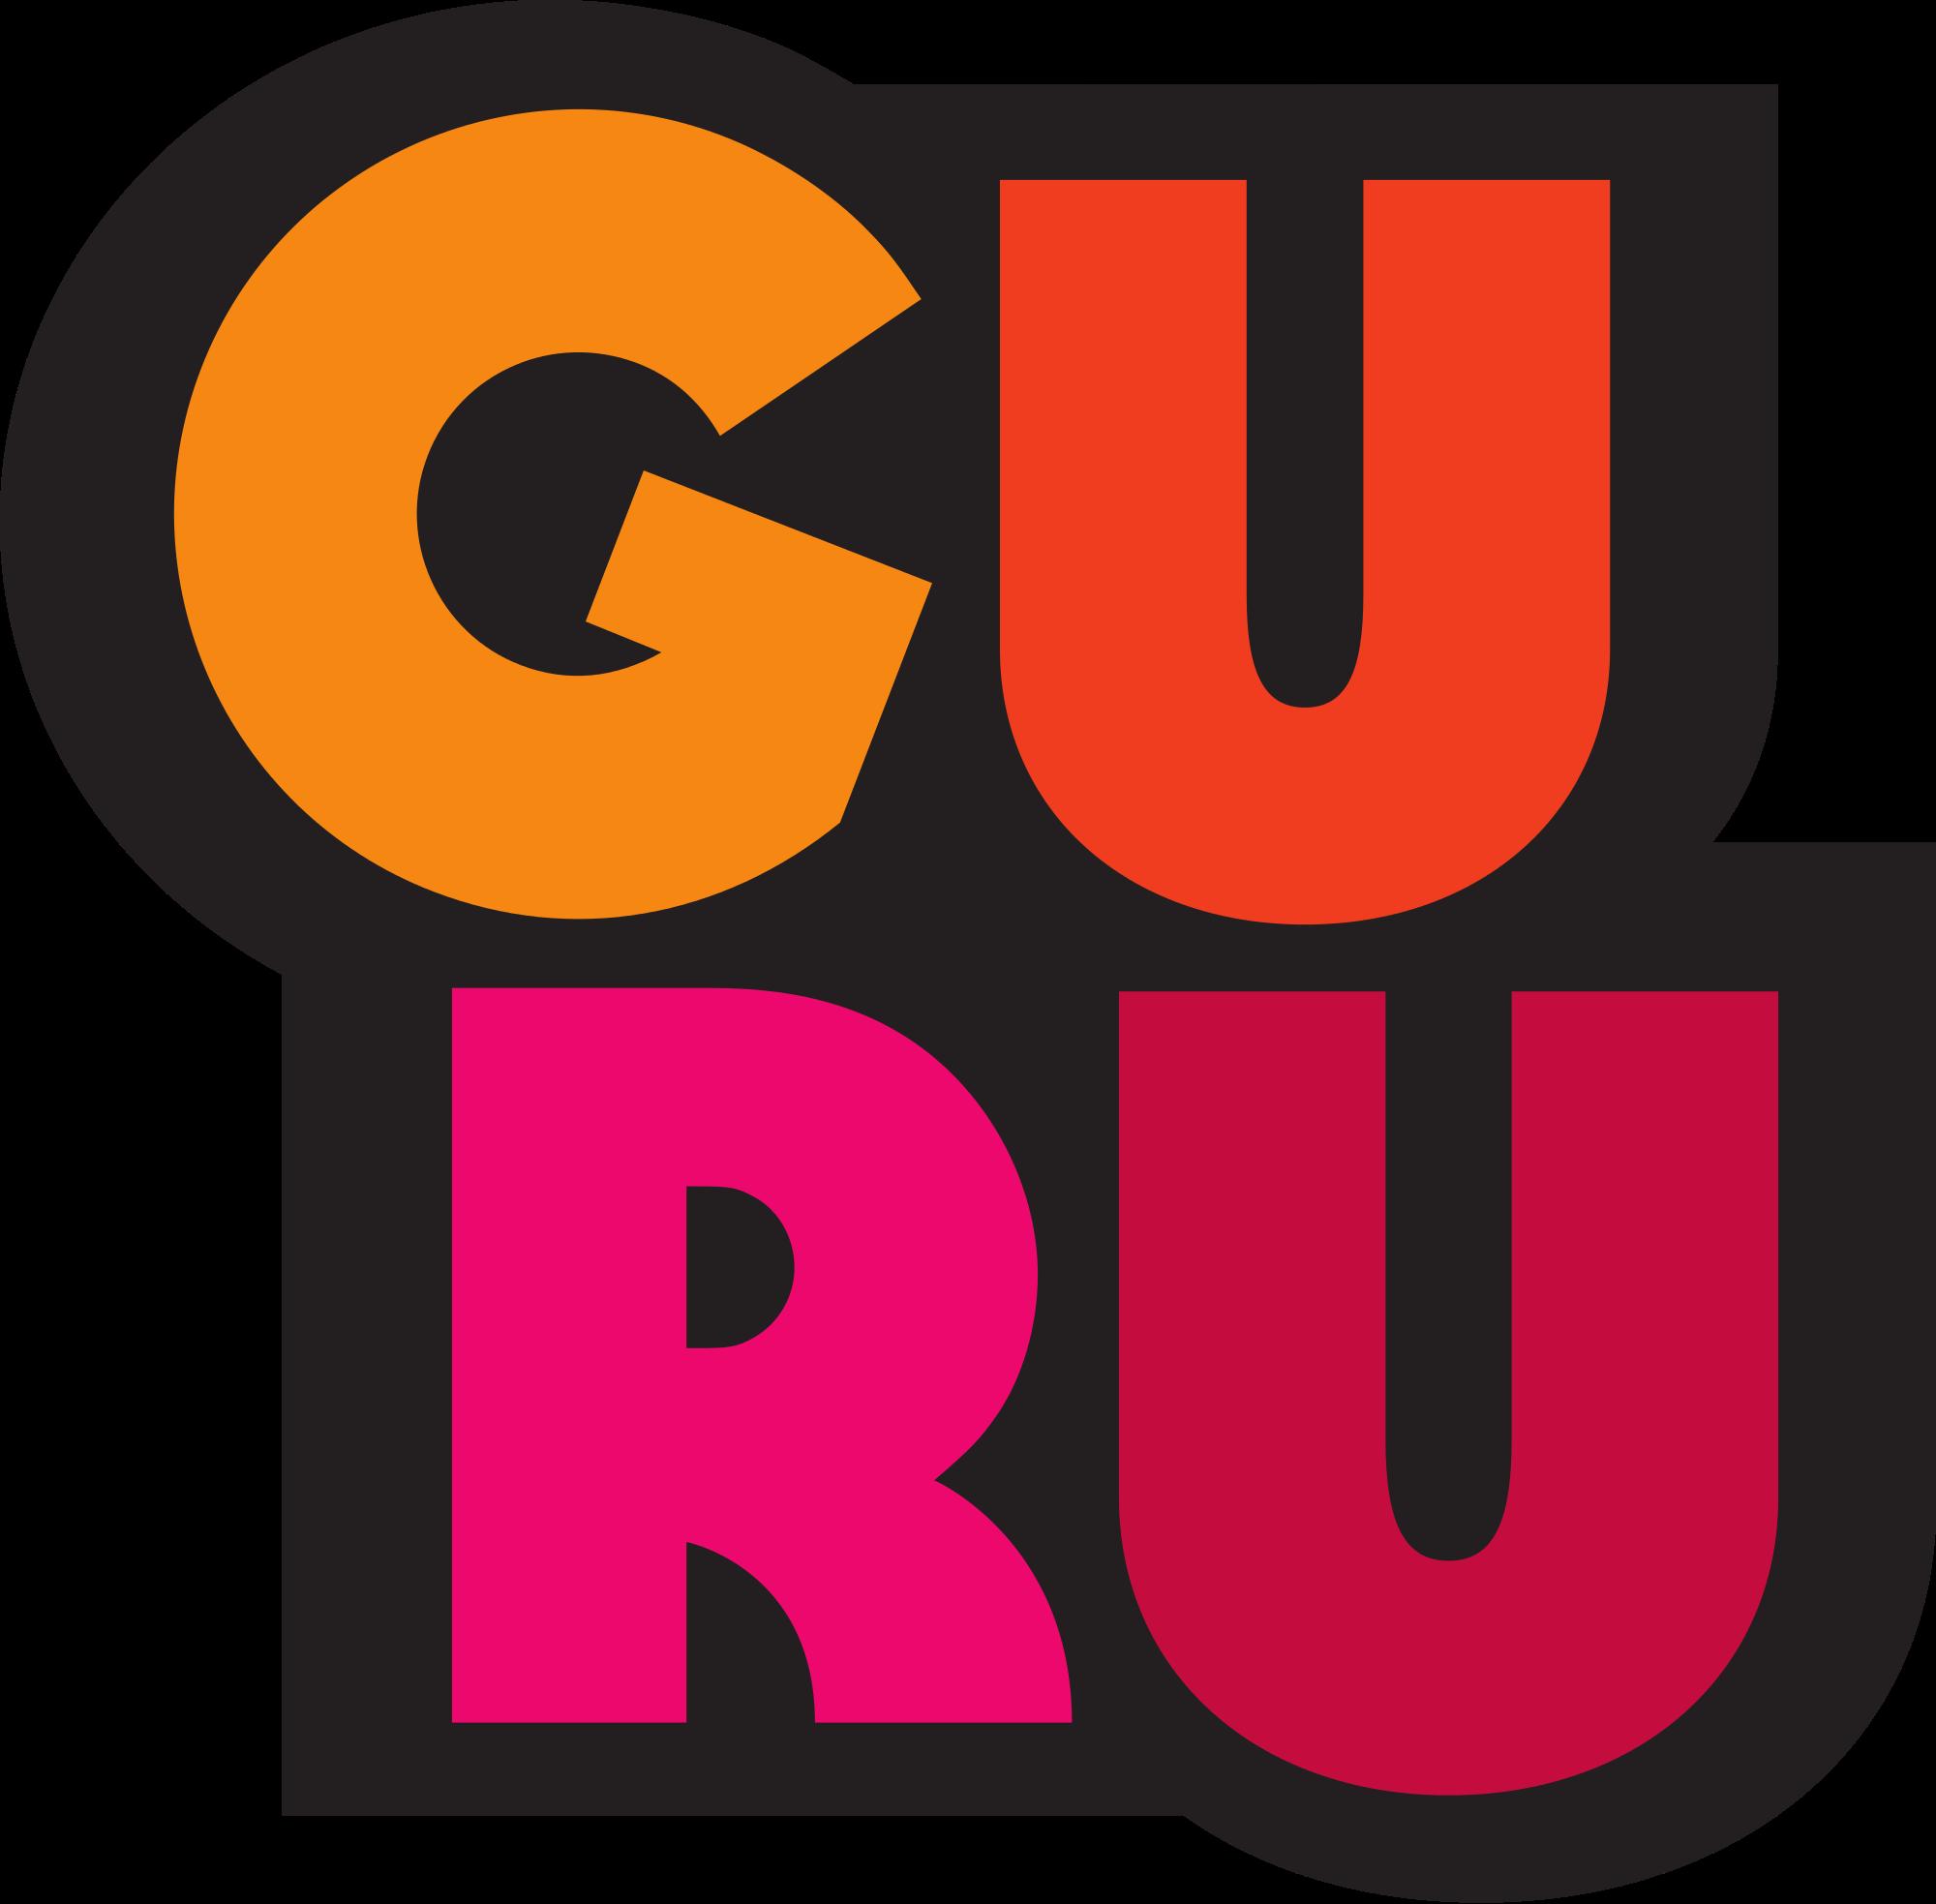 Open PlusPng pluspng.com - PNG Guru - Autoplomo PNG